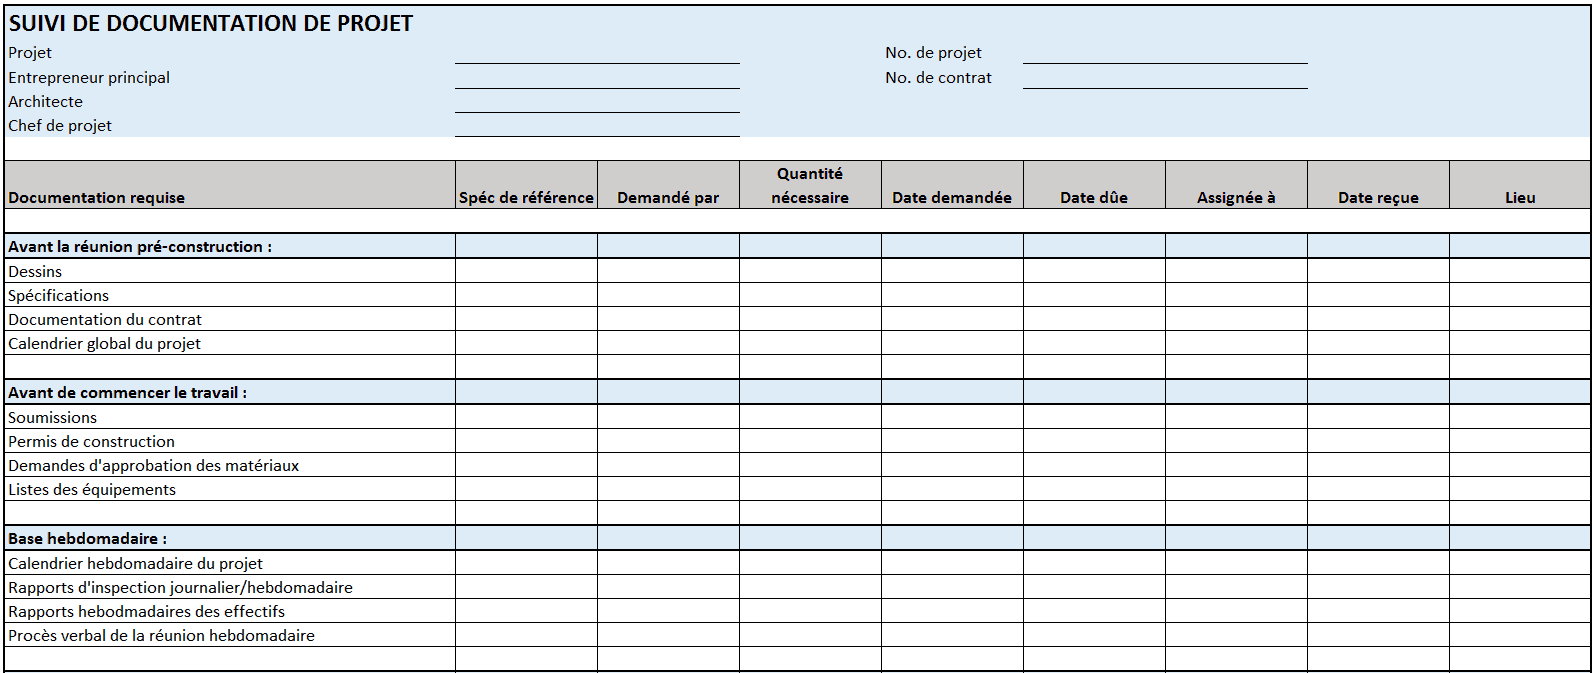 document check list proejct managment